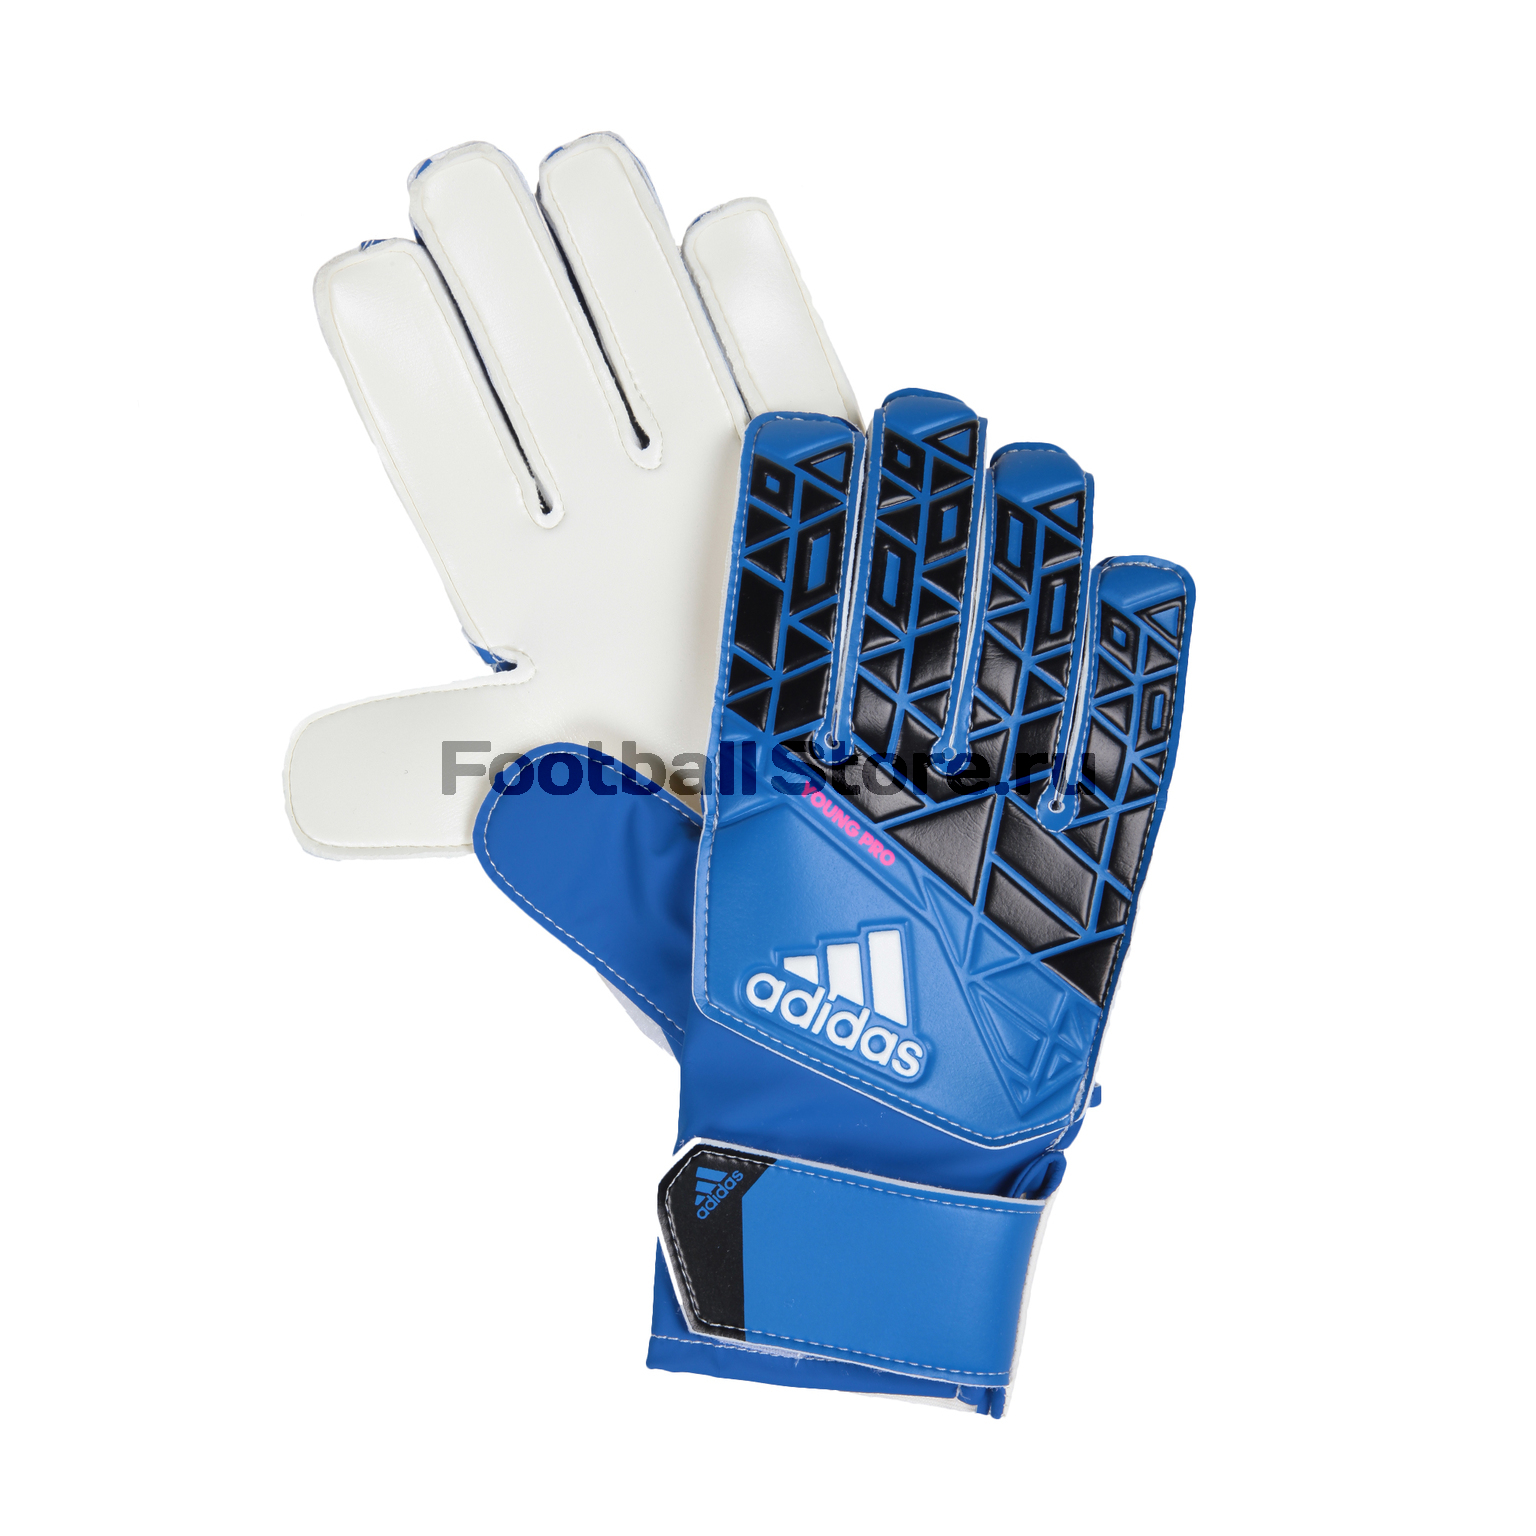 Перчатки вратарские Adidas Ace Pro AZ3679 перчатки вратарские adidas ace half neg az3688